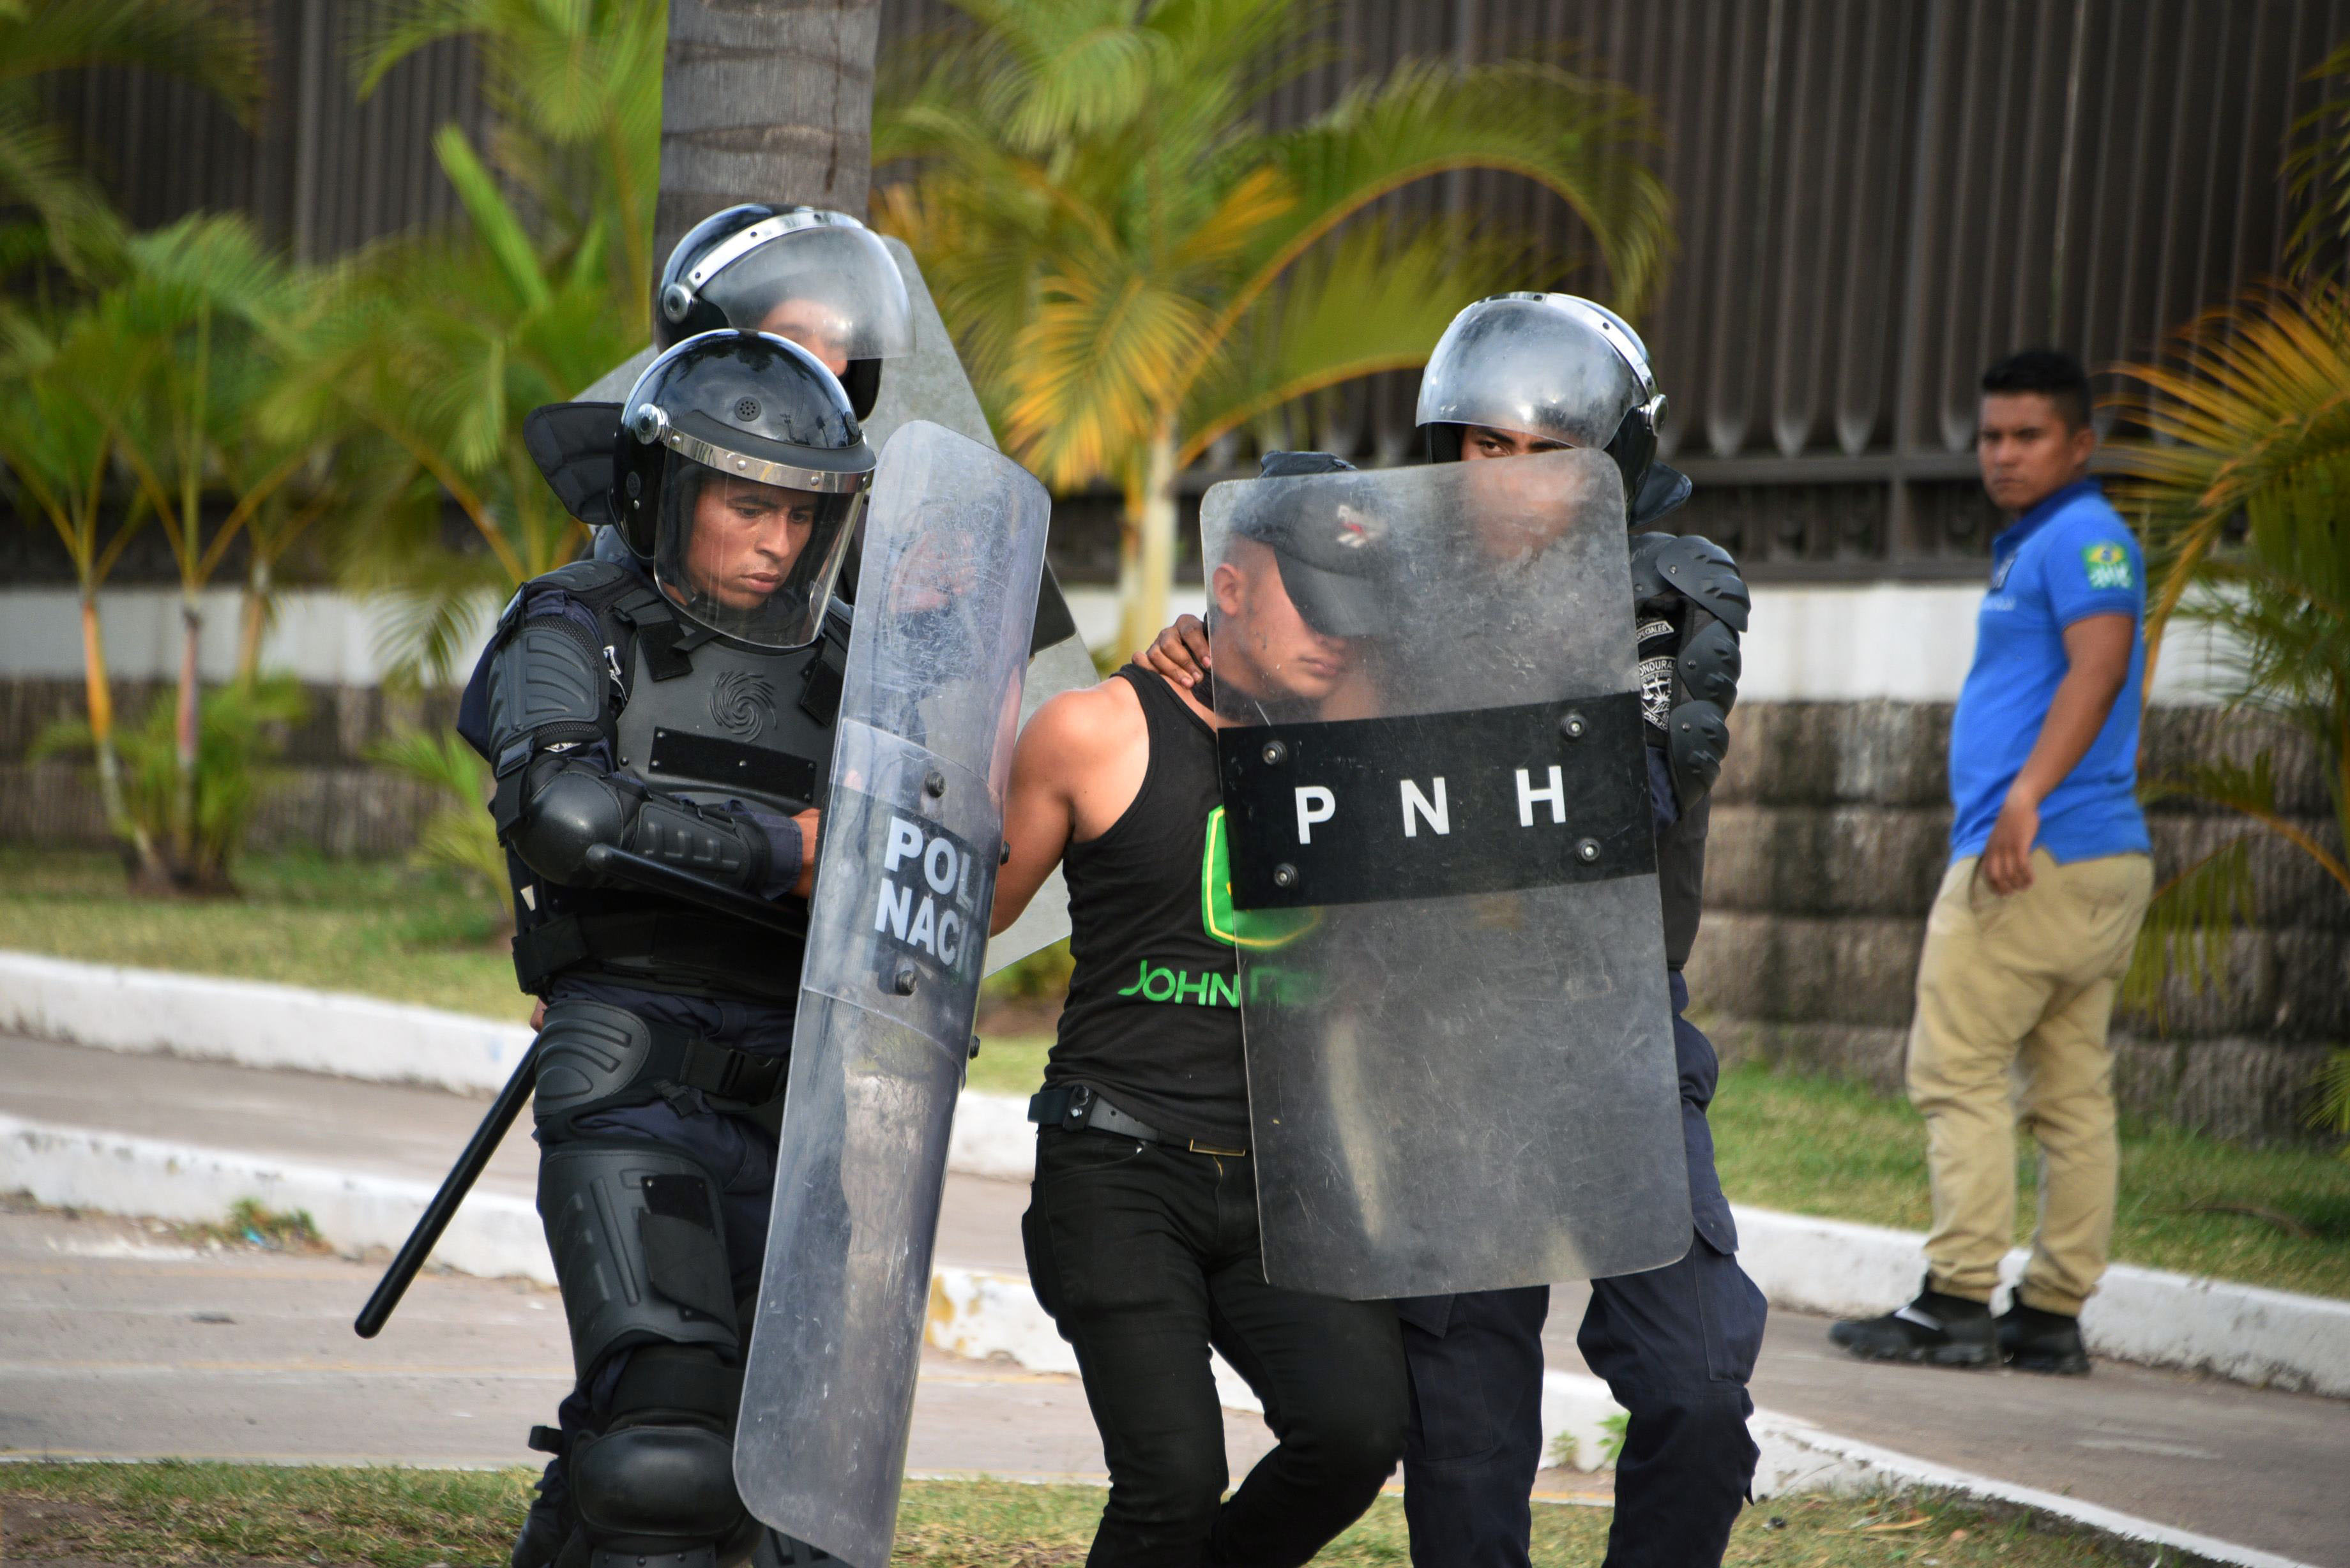 اعتقال متظاهر